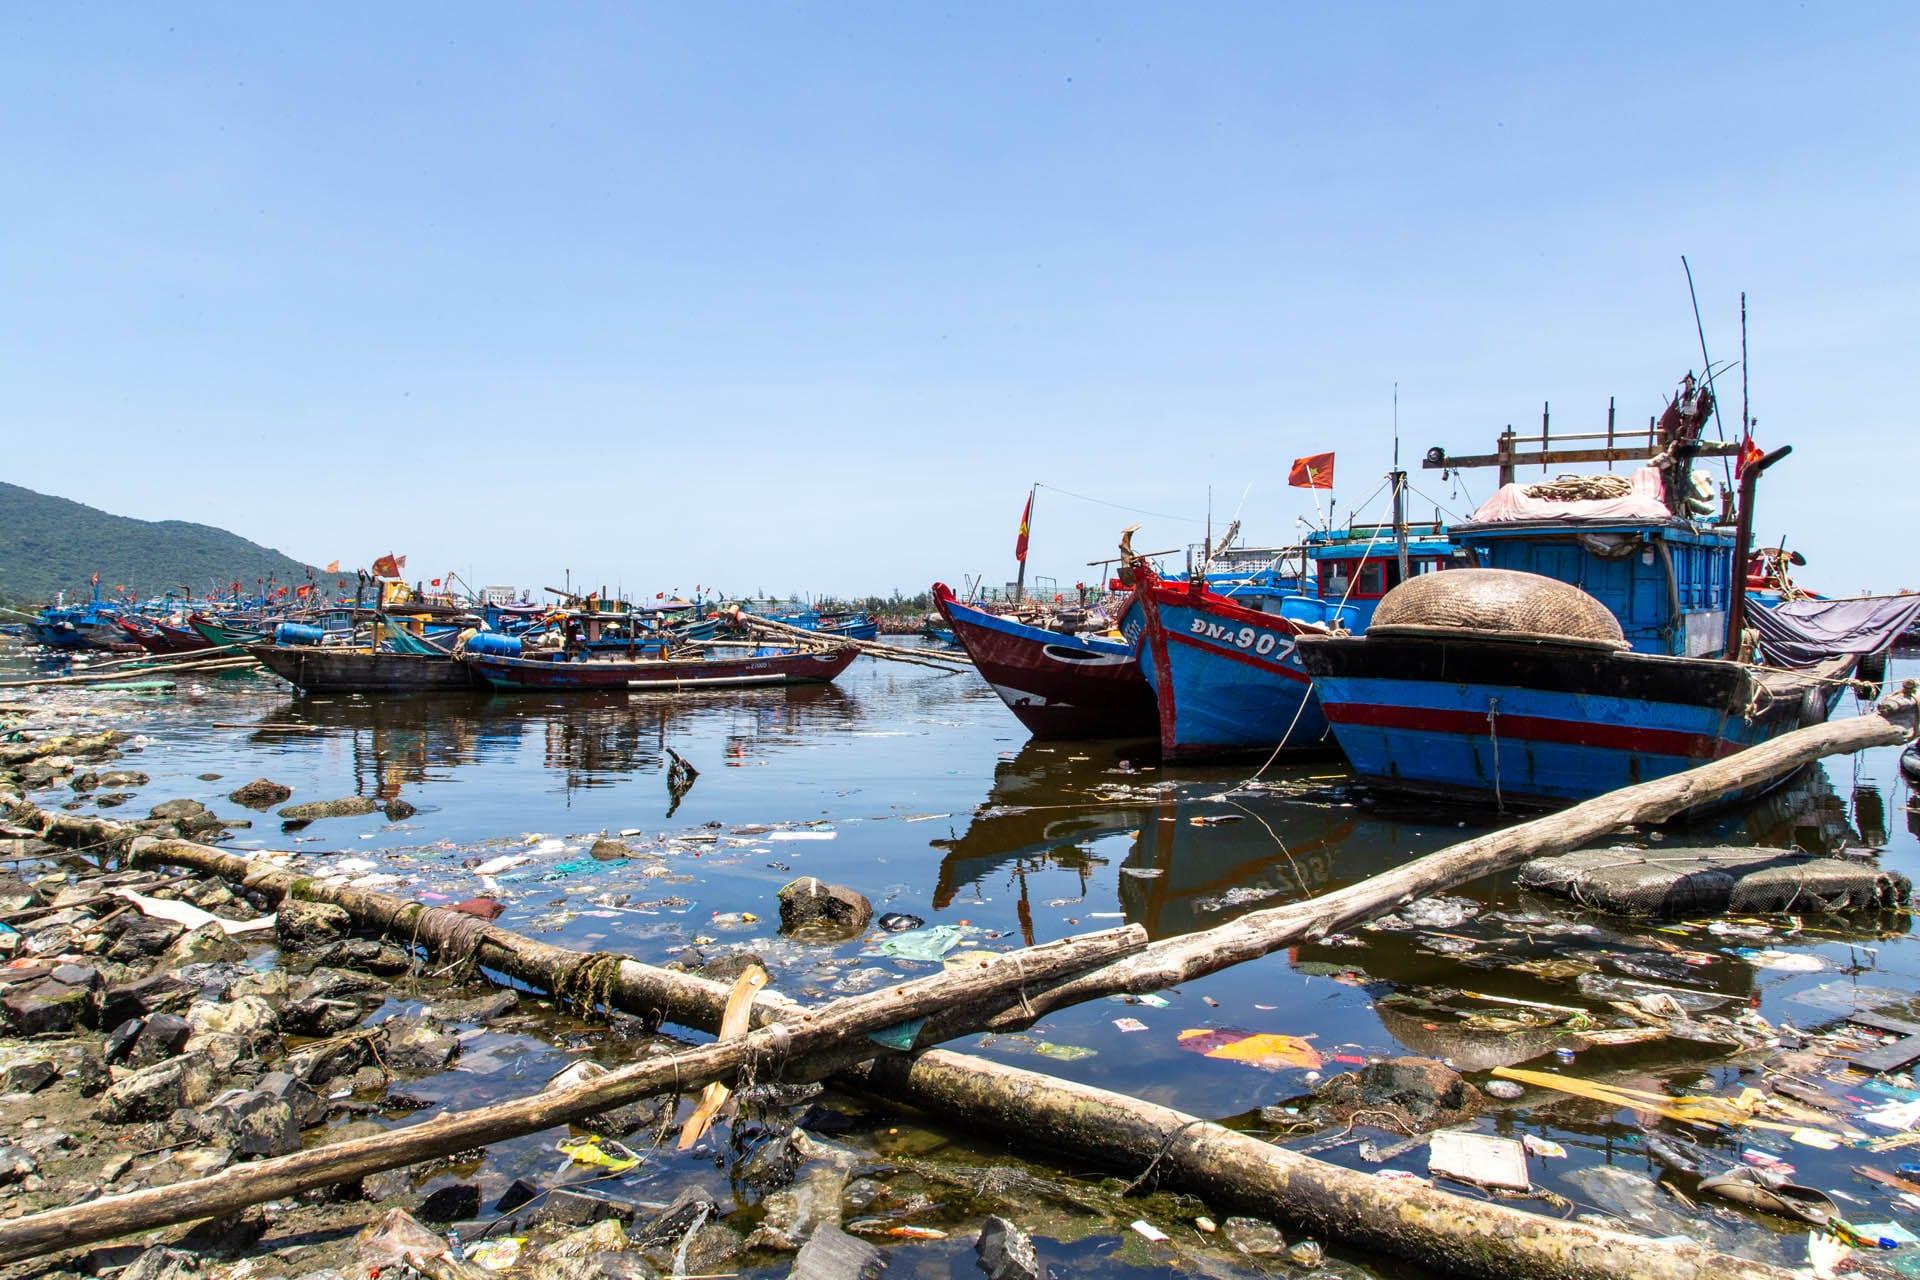 Rubbish in the water at Da Nang's fishing port